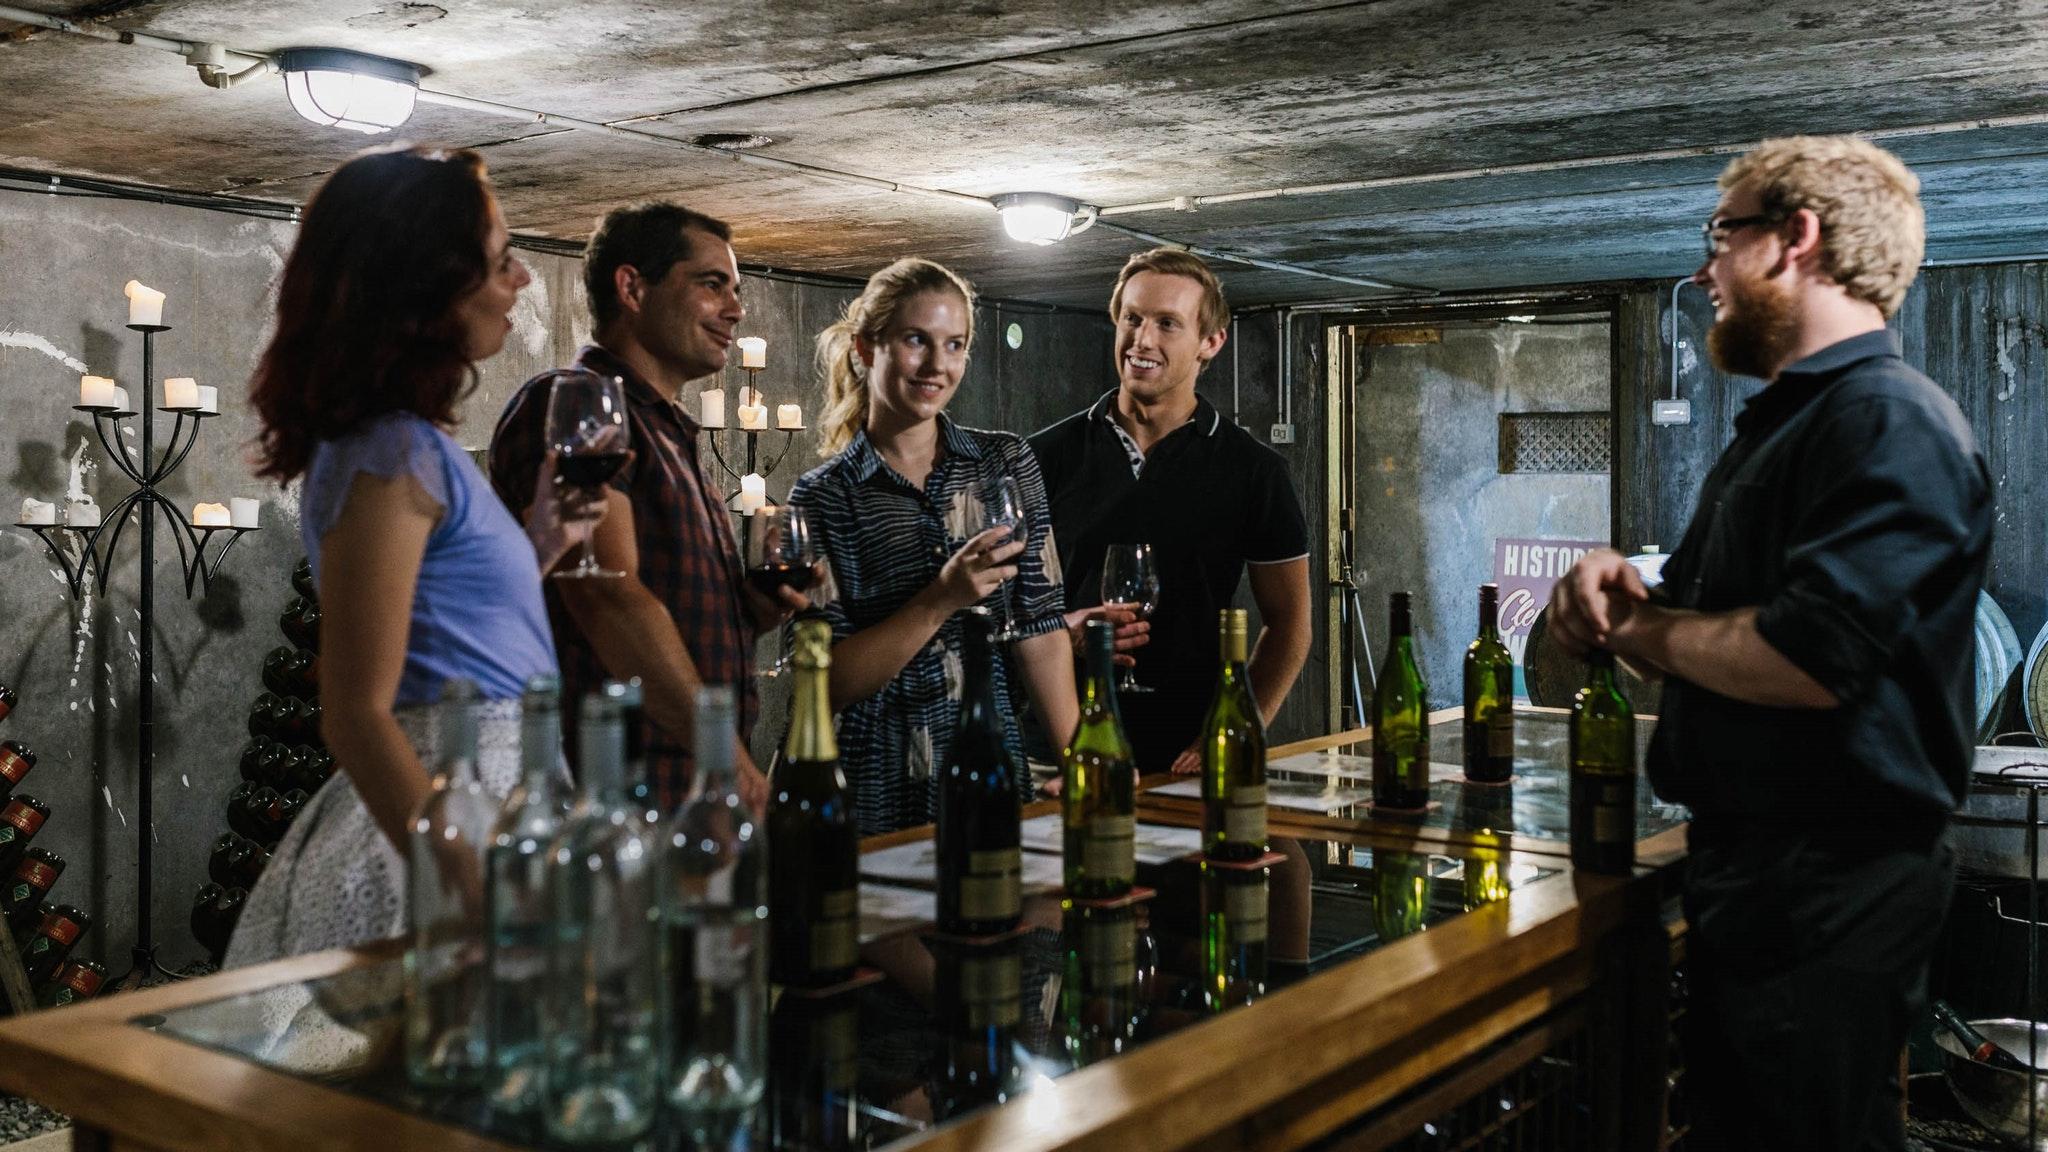 Tastings Underground Cellar door at Cleveland Winery